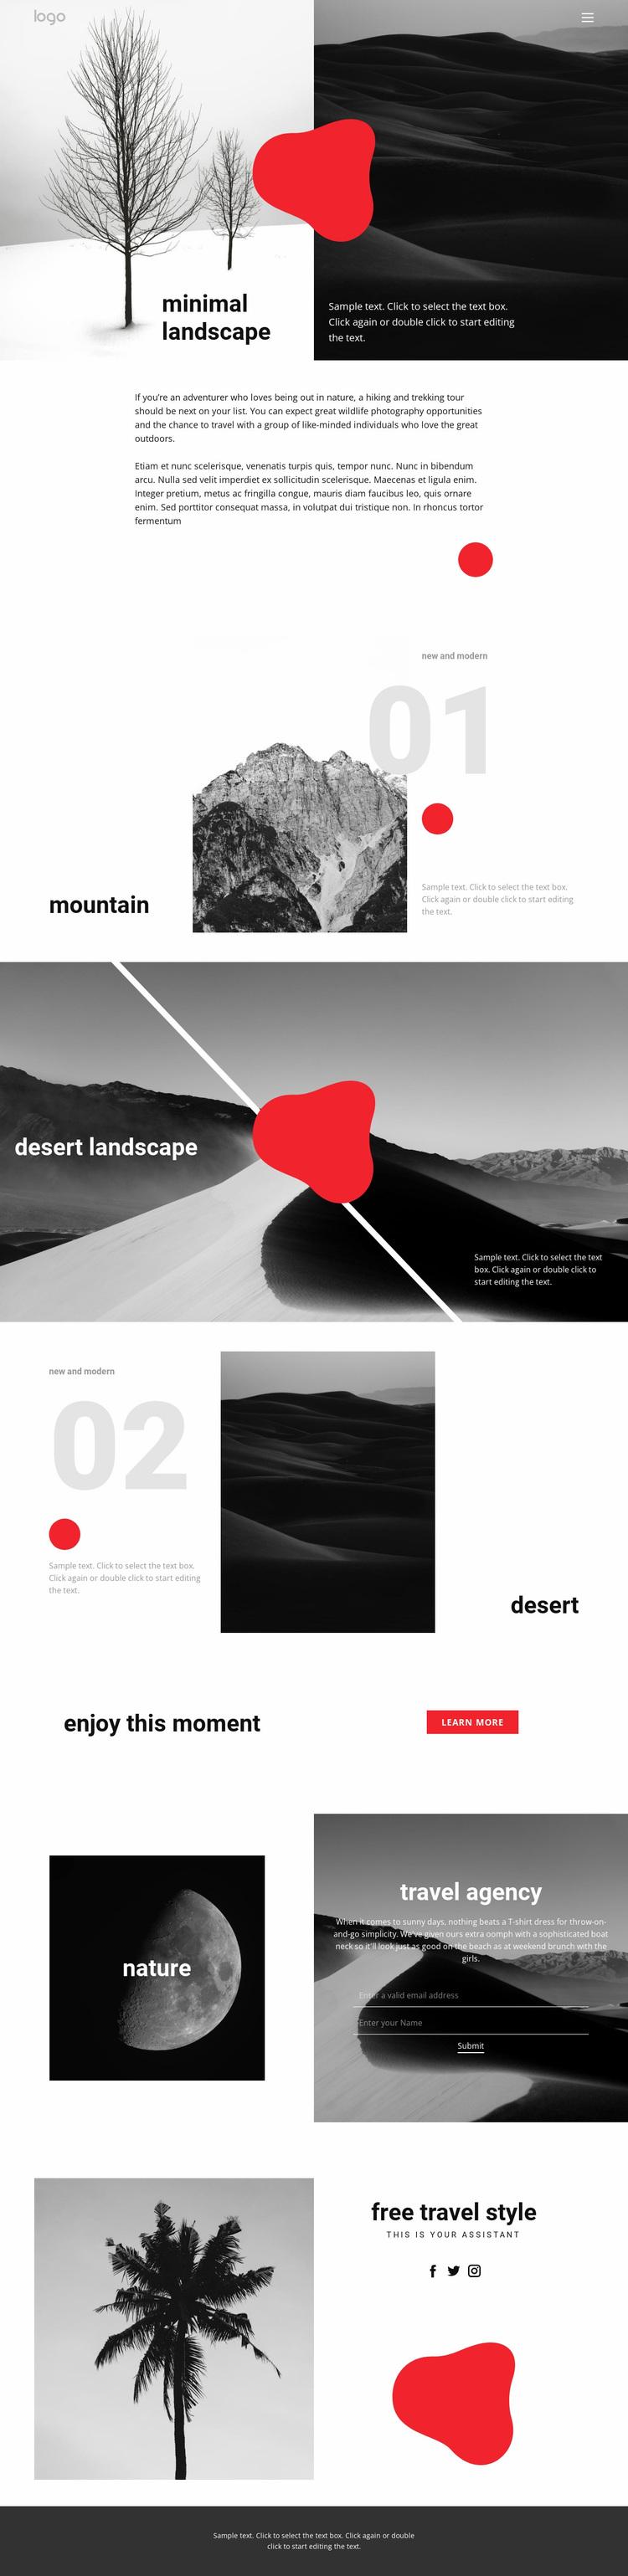 Minimal landscape photo Website Design